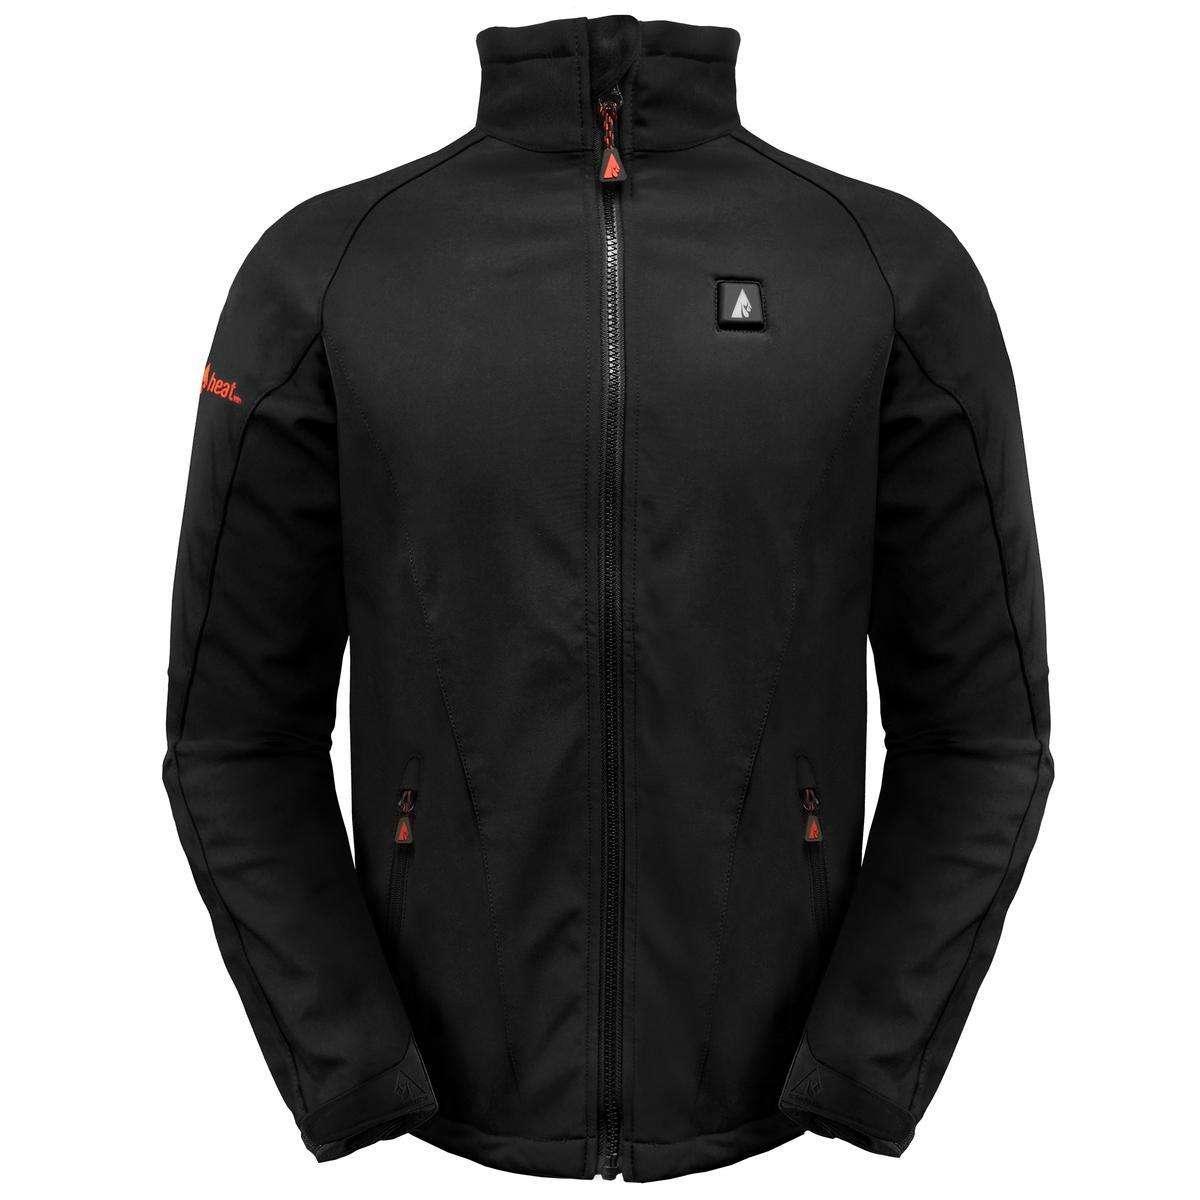 ActionHeat 5V Battery Heated Jacket – Men's